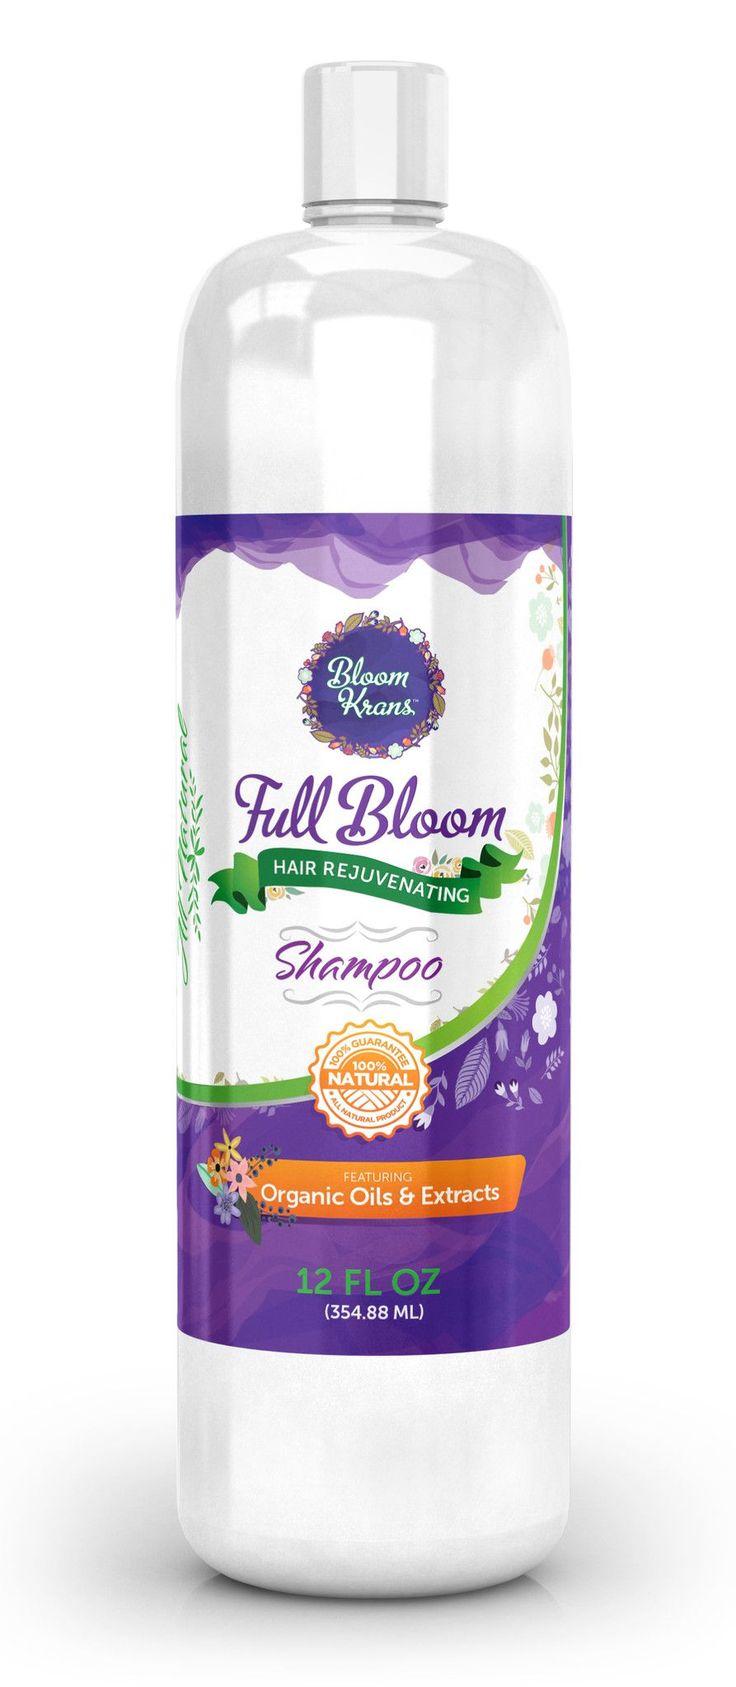 Anti Hair Loss Shampoo - Promotes Hair Growth - Organic & Natural Ing. (Biotin, Apple Stem Cells, Keratin, Saw Palmetto DHT Blocker) - Natural Shampoo -SLS Free Shampoo & Sulfate Free http://www.hairgrowinggenius.com/